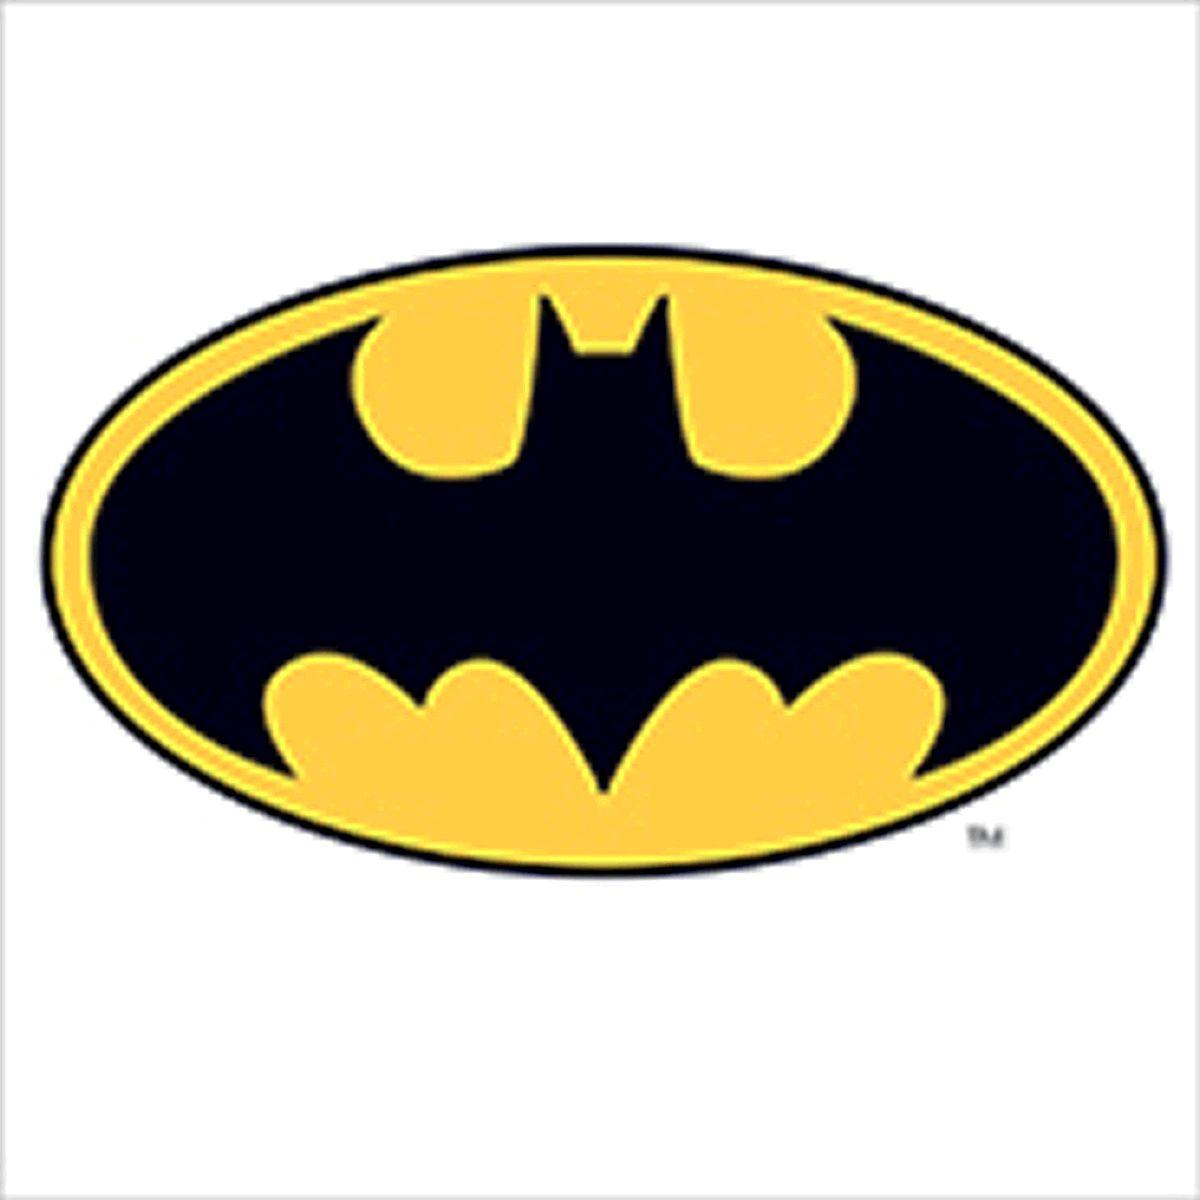 e809bddc7 Batman Kids Character Shirts & Clothing - Macy's